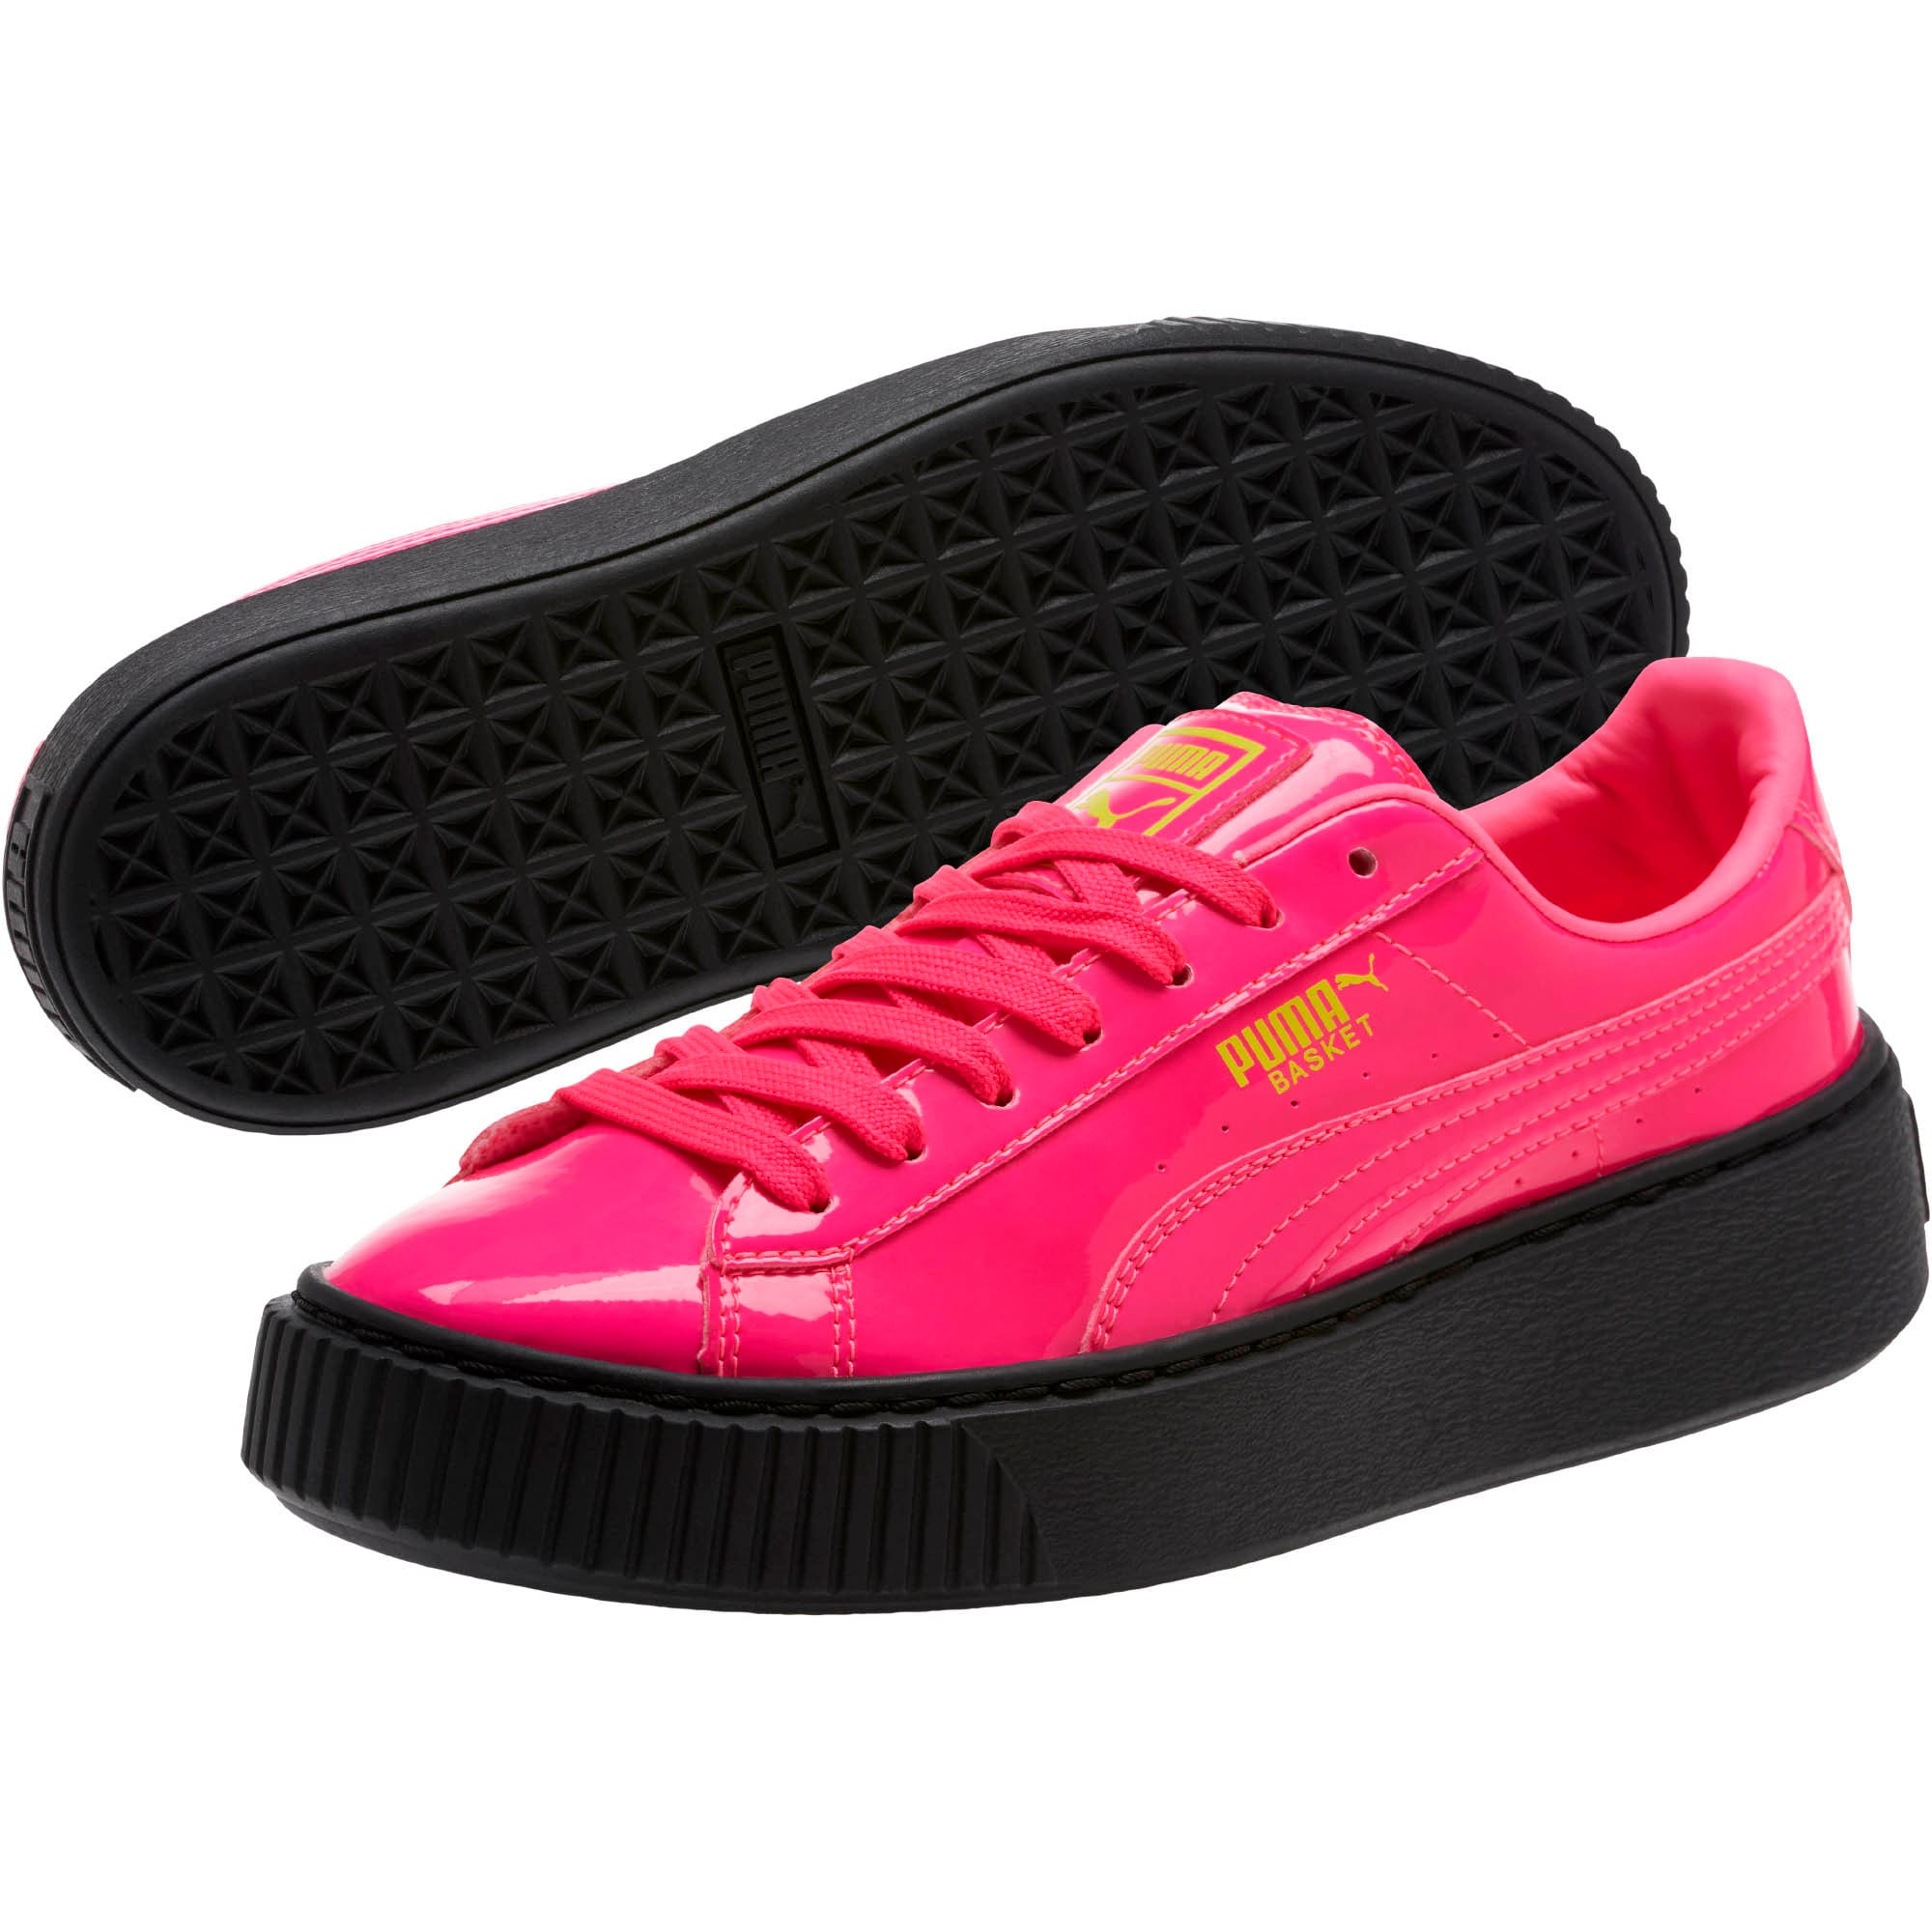 Thumbnail 2 of Basket Platform Block JR  Sneakers, PINK-Sulphur Spr-Black, medium